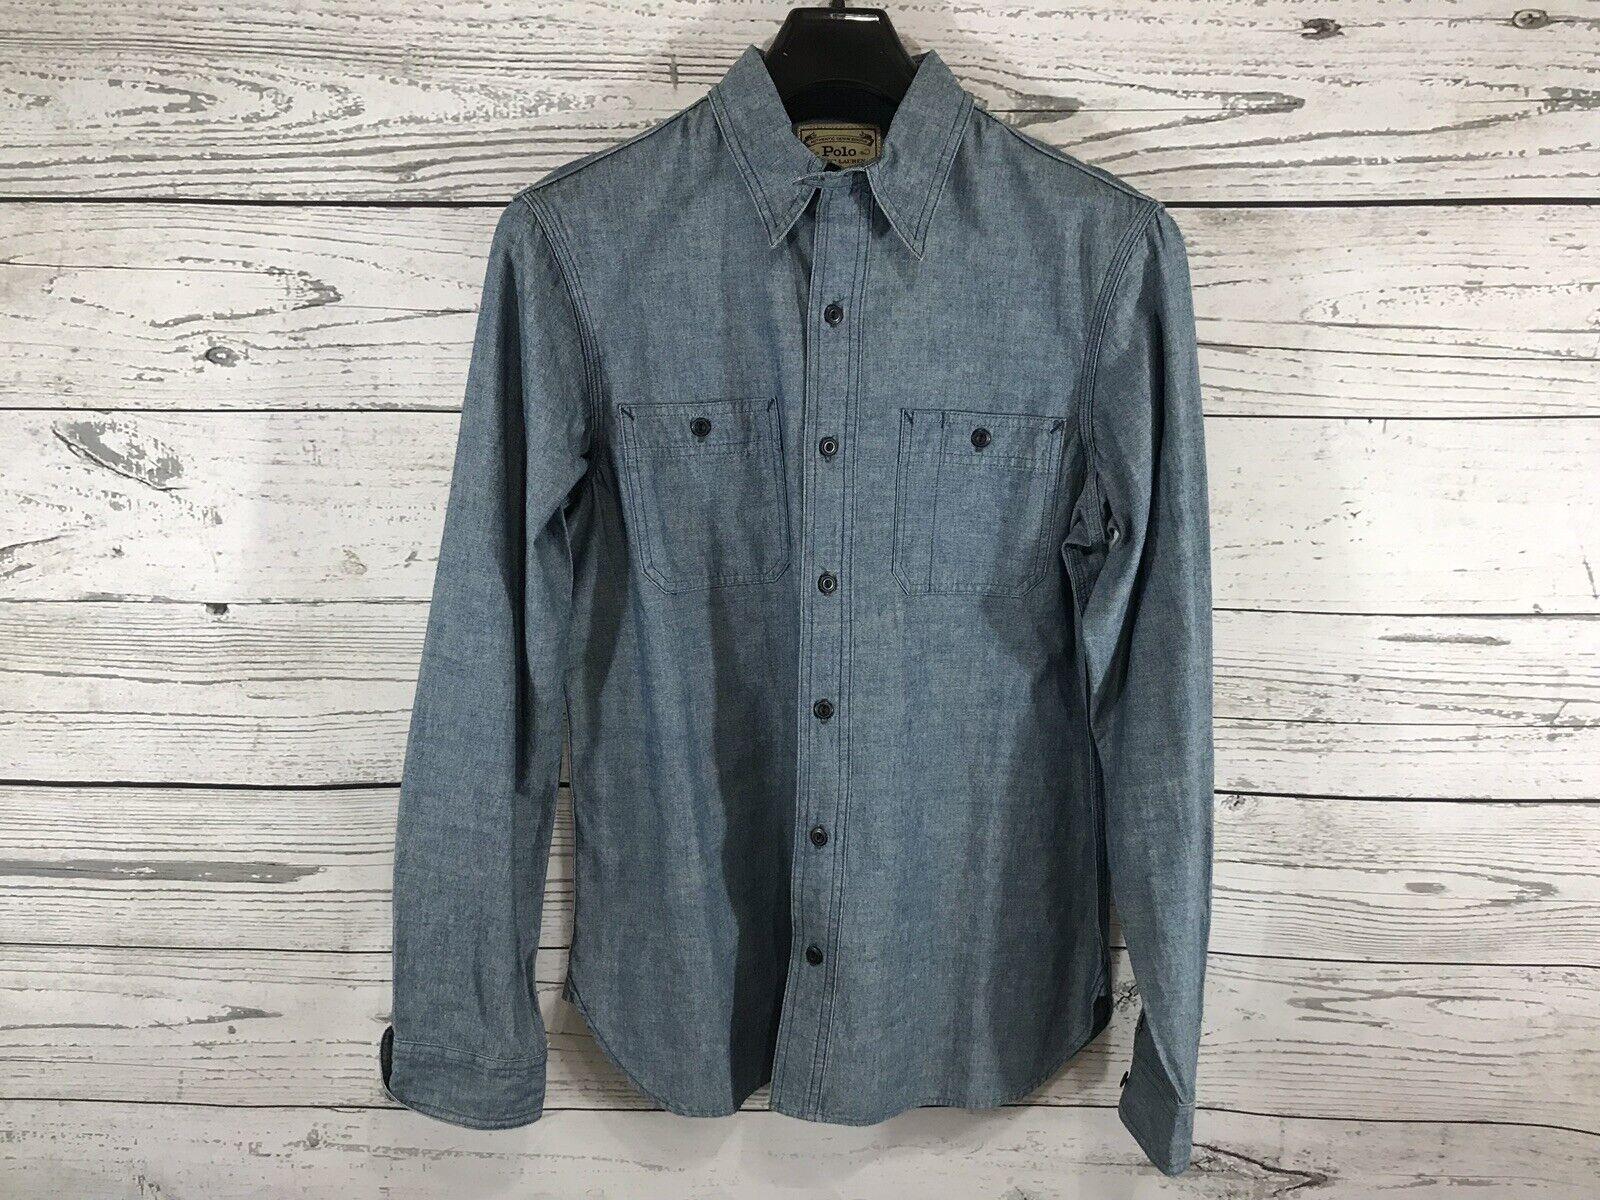 Polo Ralph Lauren bluee Mens Authentic Denim L S Button Down Shirt Sz Medium NWT